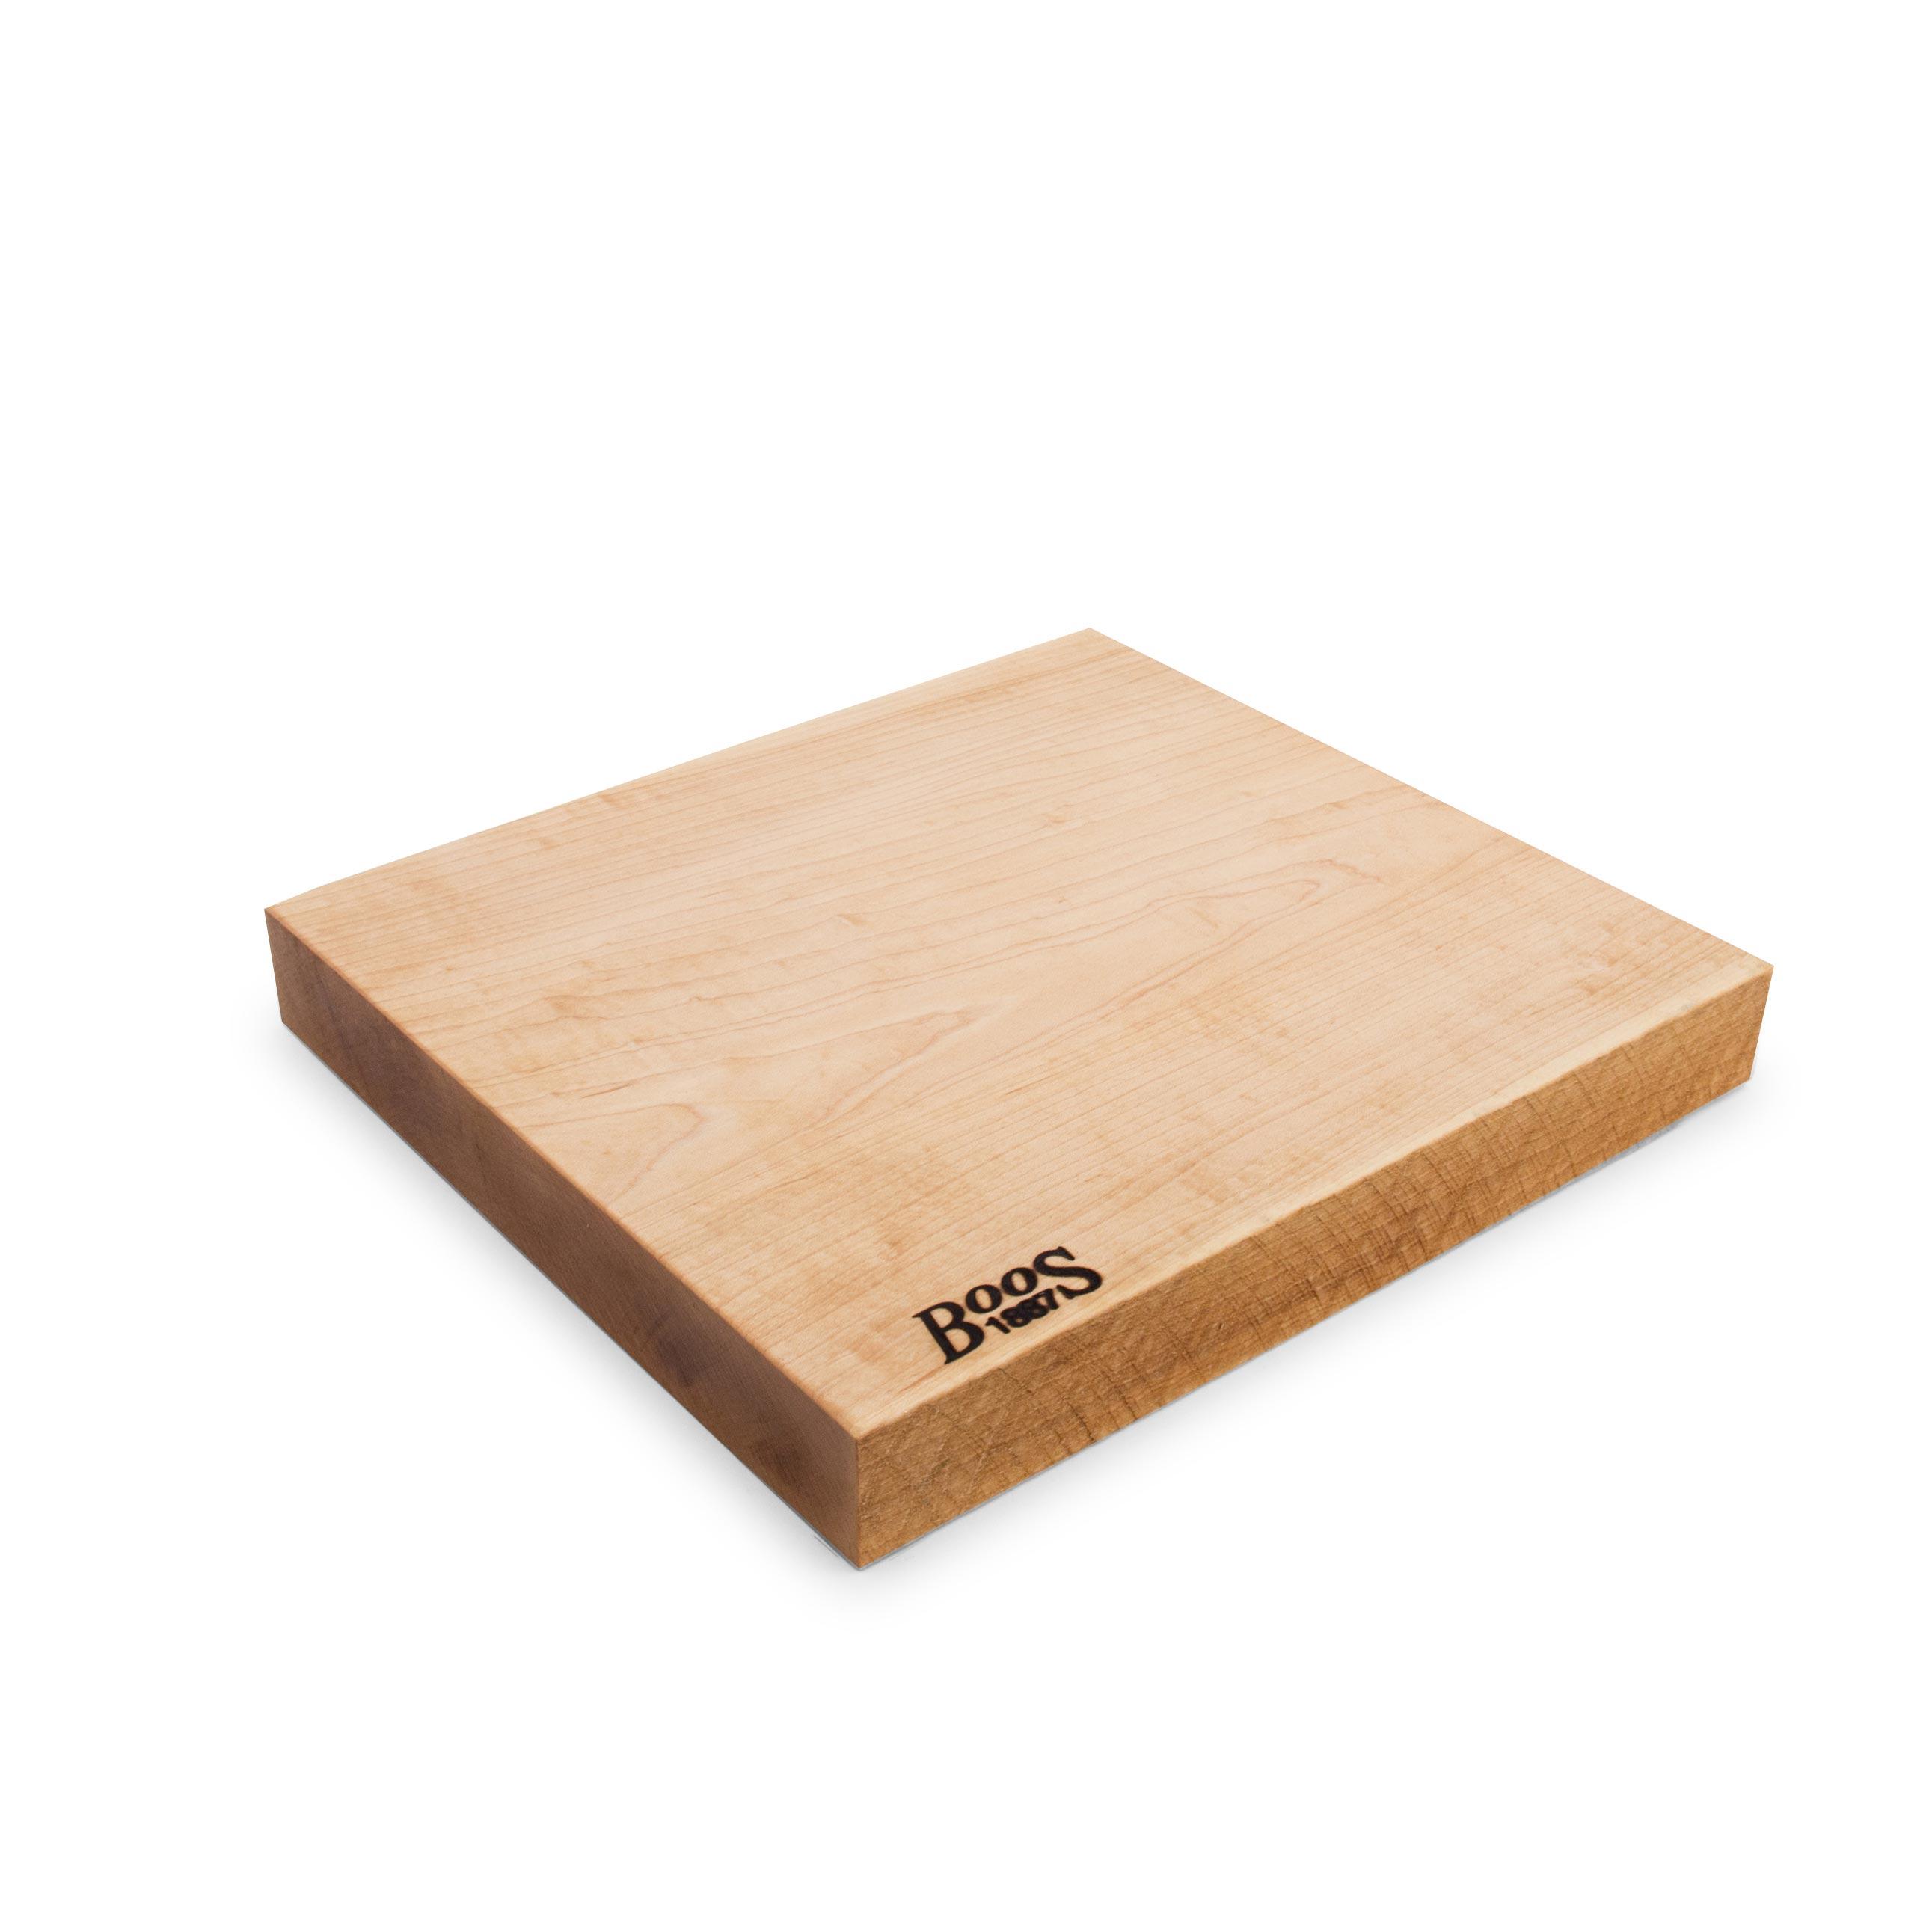 John Boos MPL-RST1312175 cutting board, wood